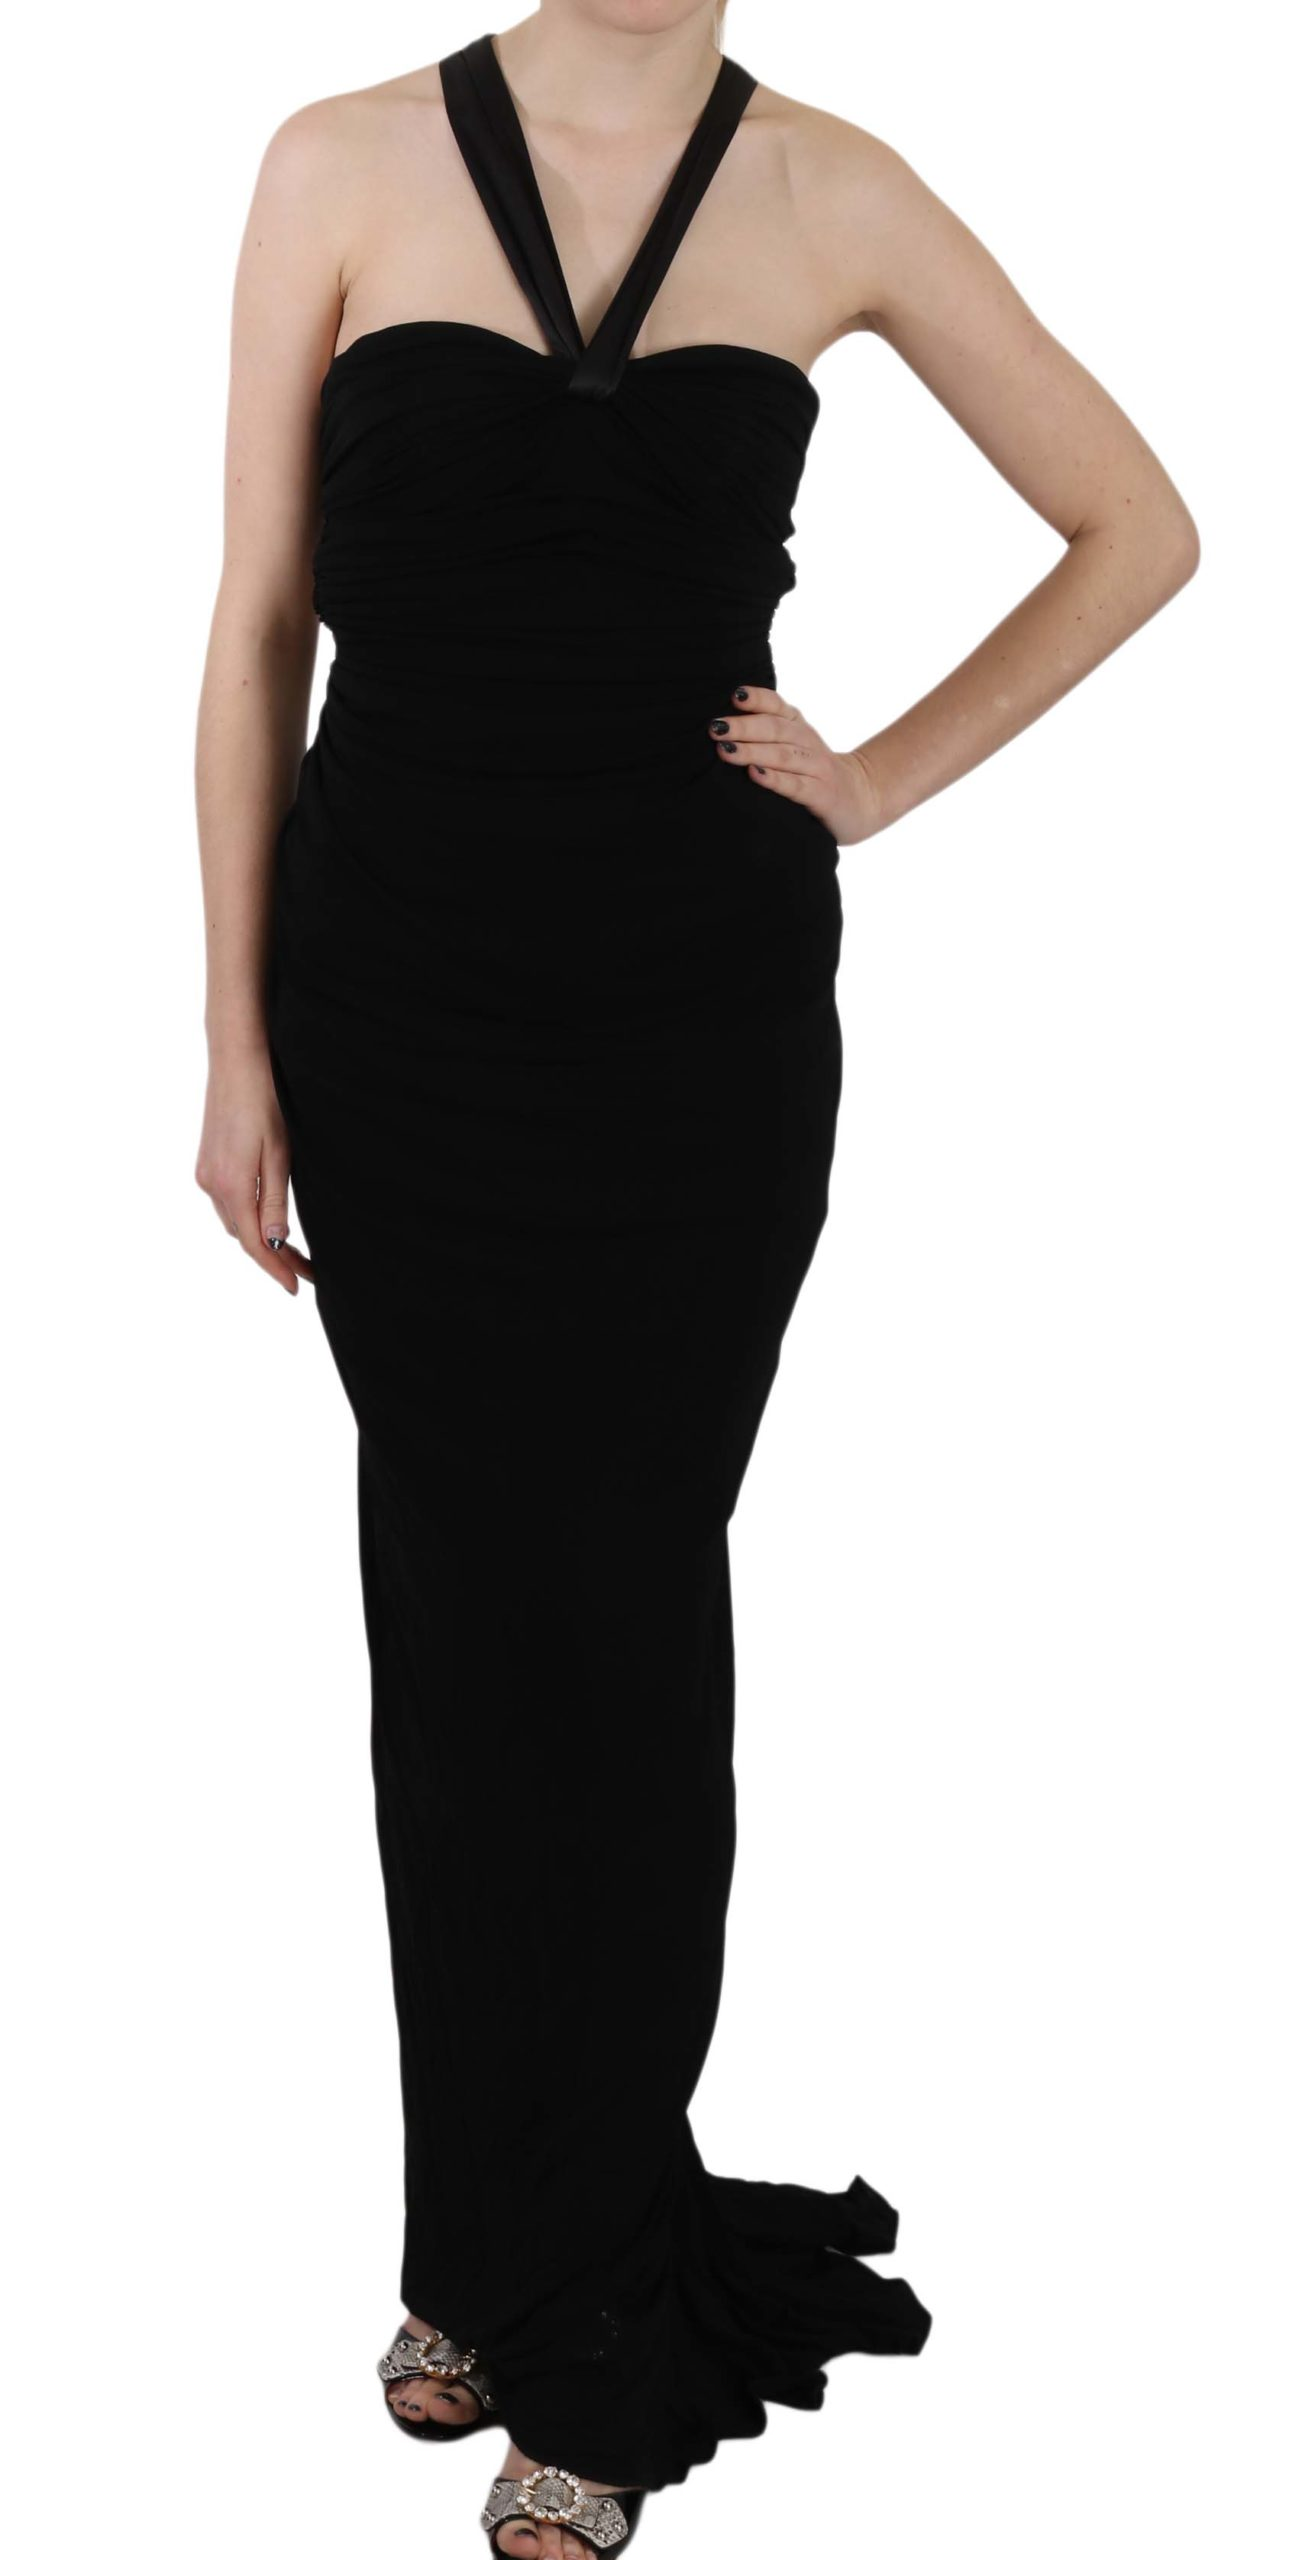 Dolce & Gabbana Women's Halter Sheath Sleeveless Gown Dress DR1685 - IT40|S